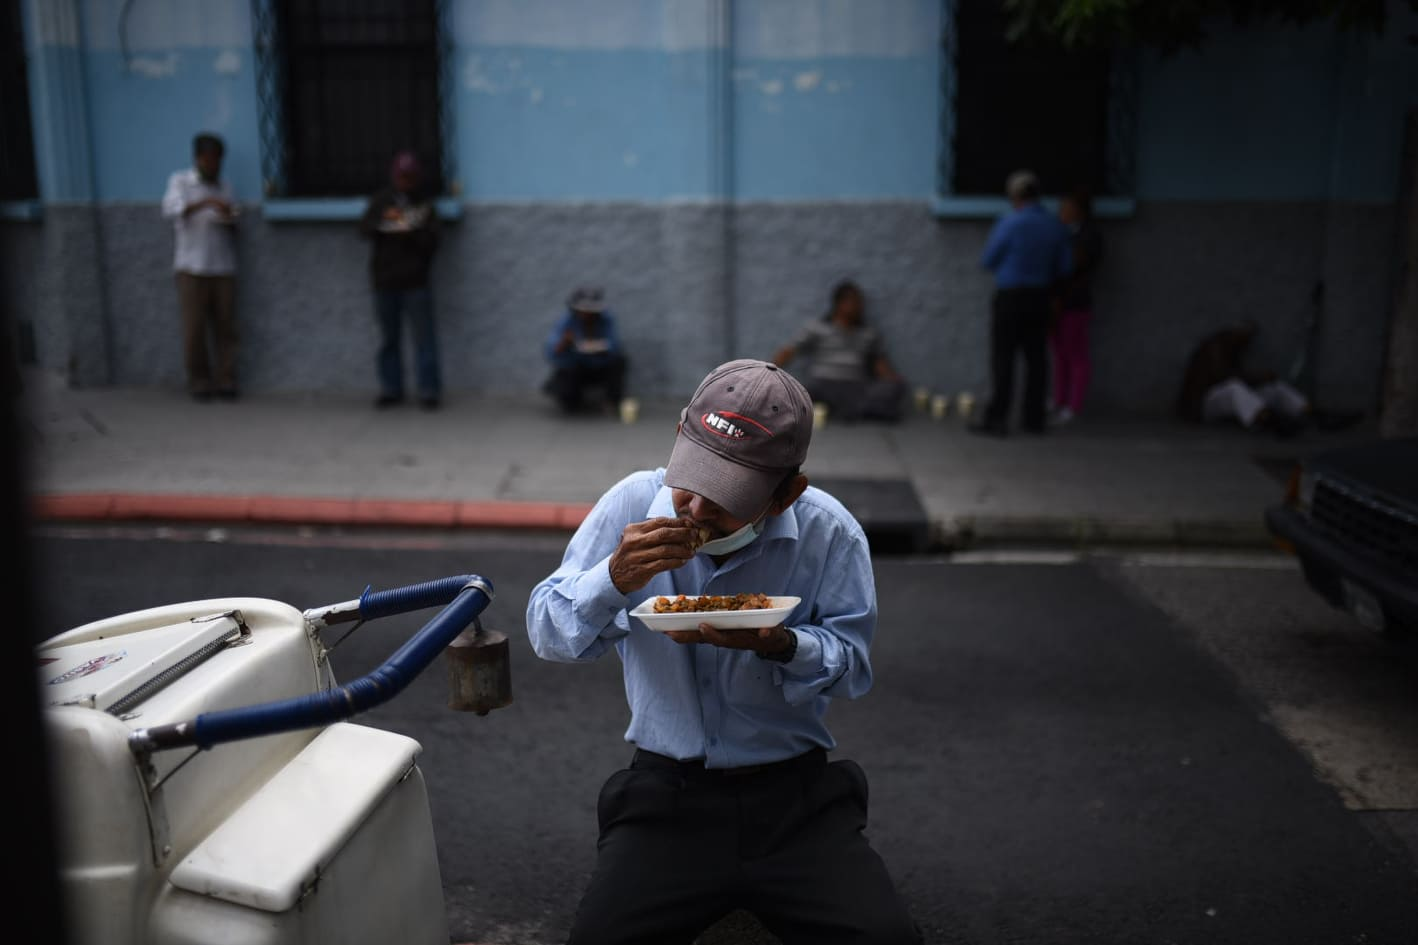 Olla Comunitaria deja de entregar alimentos a partir del 15 de septiembre